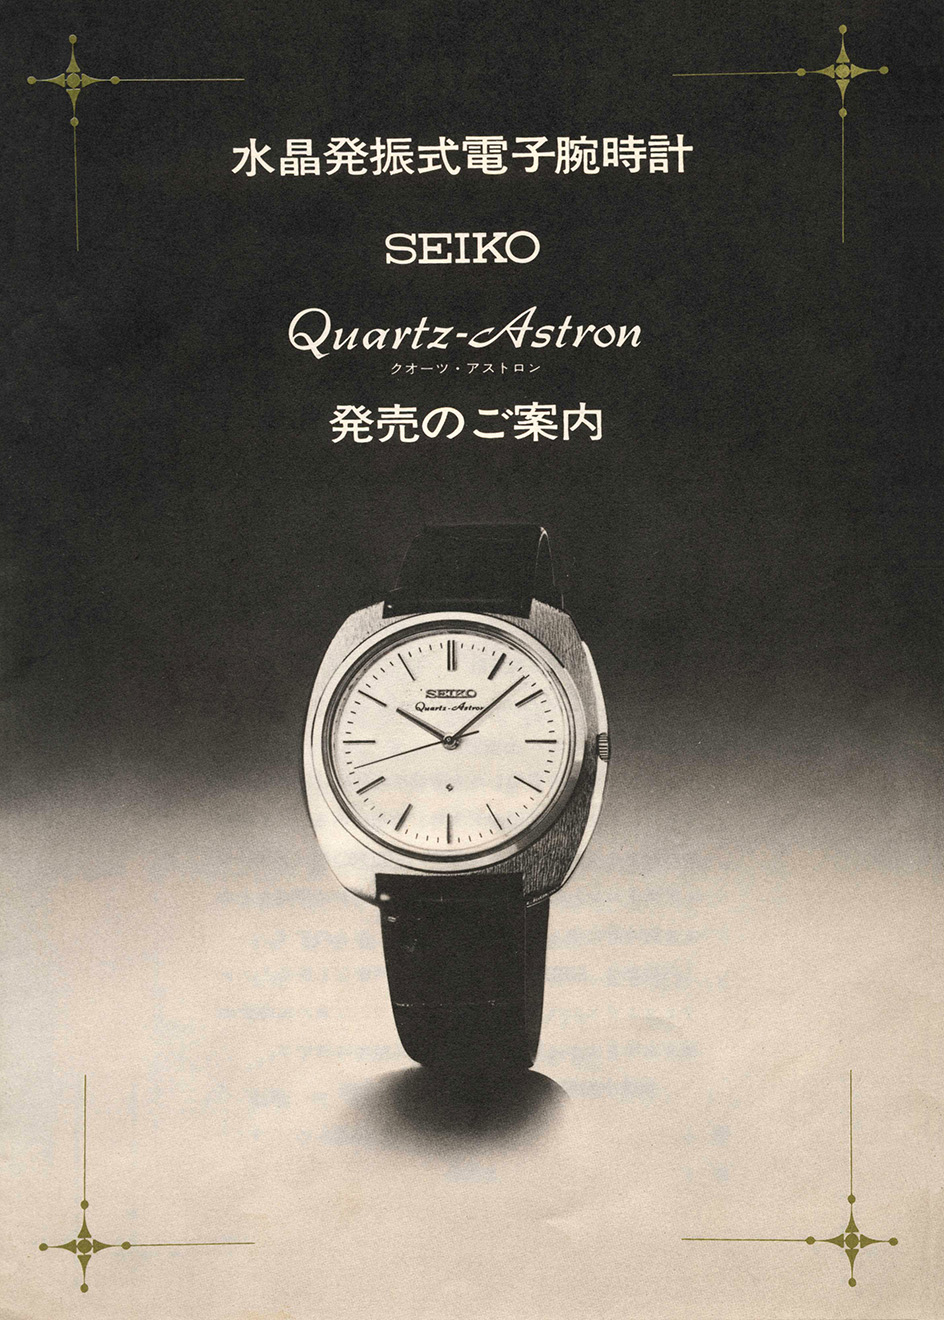 Seiko Quartz Astron Brochure